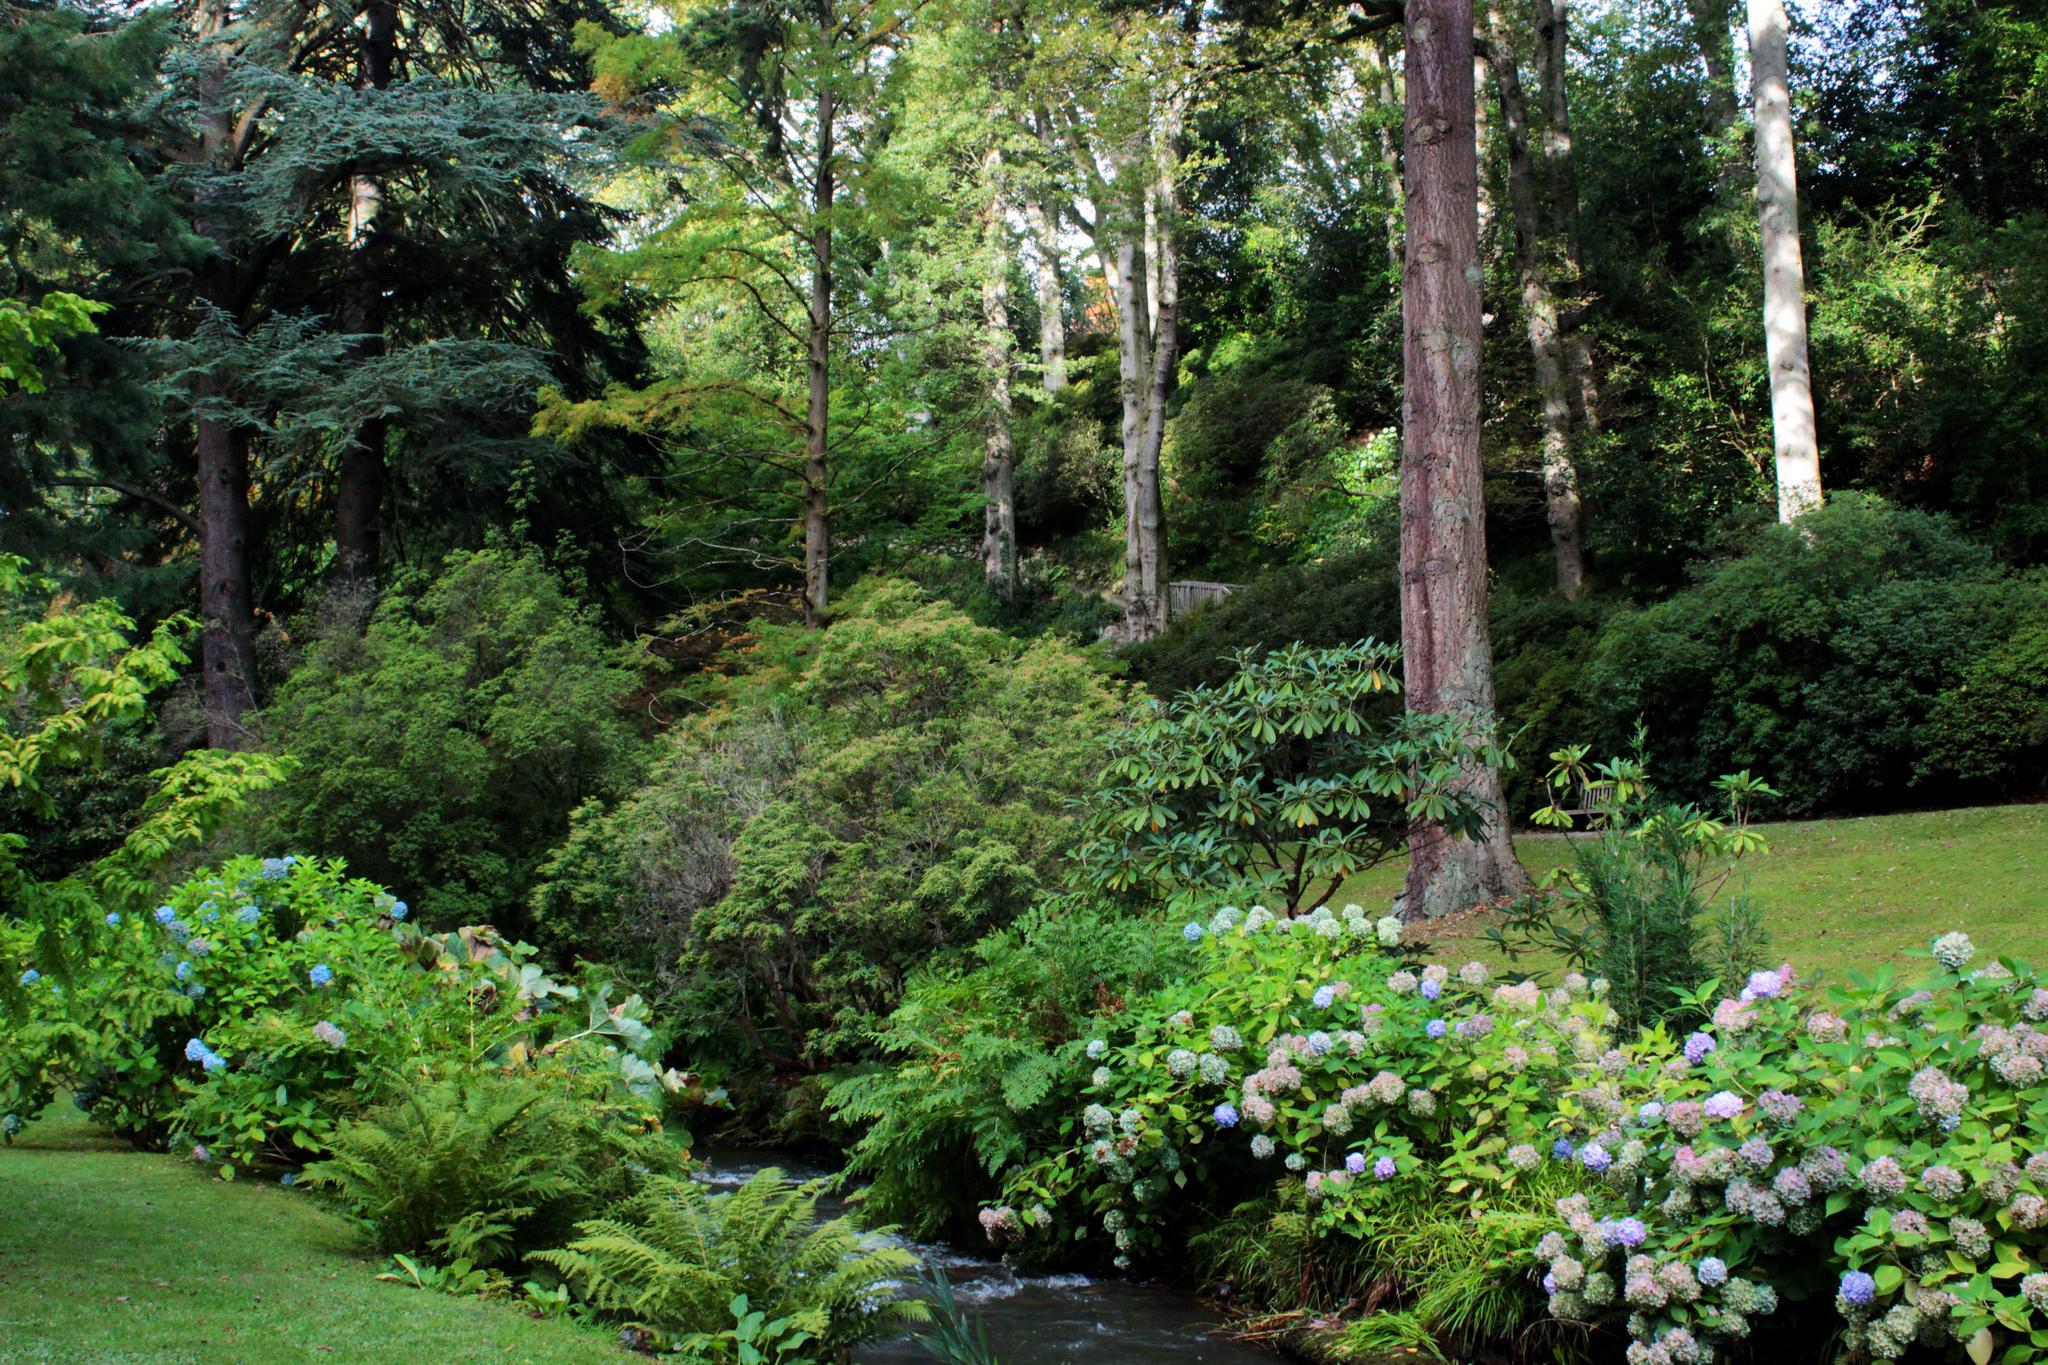 Bodnant gardens picnic